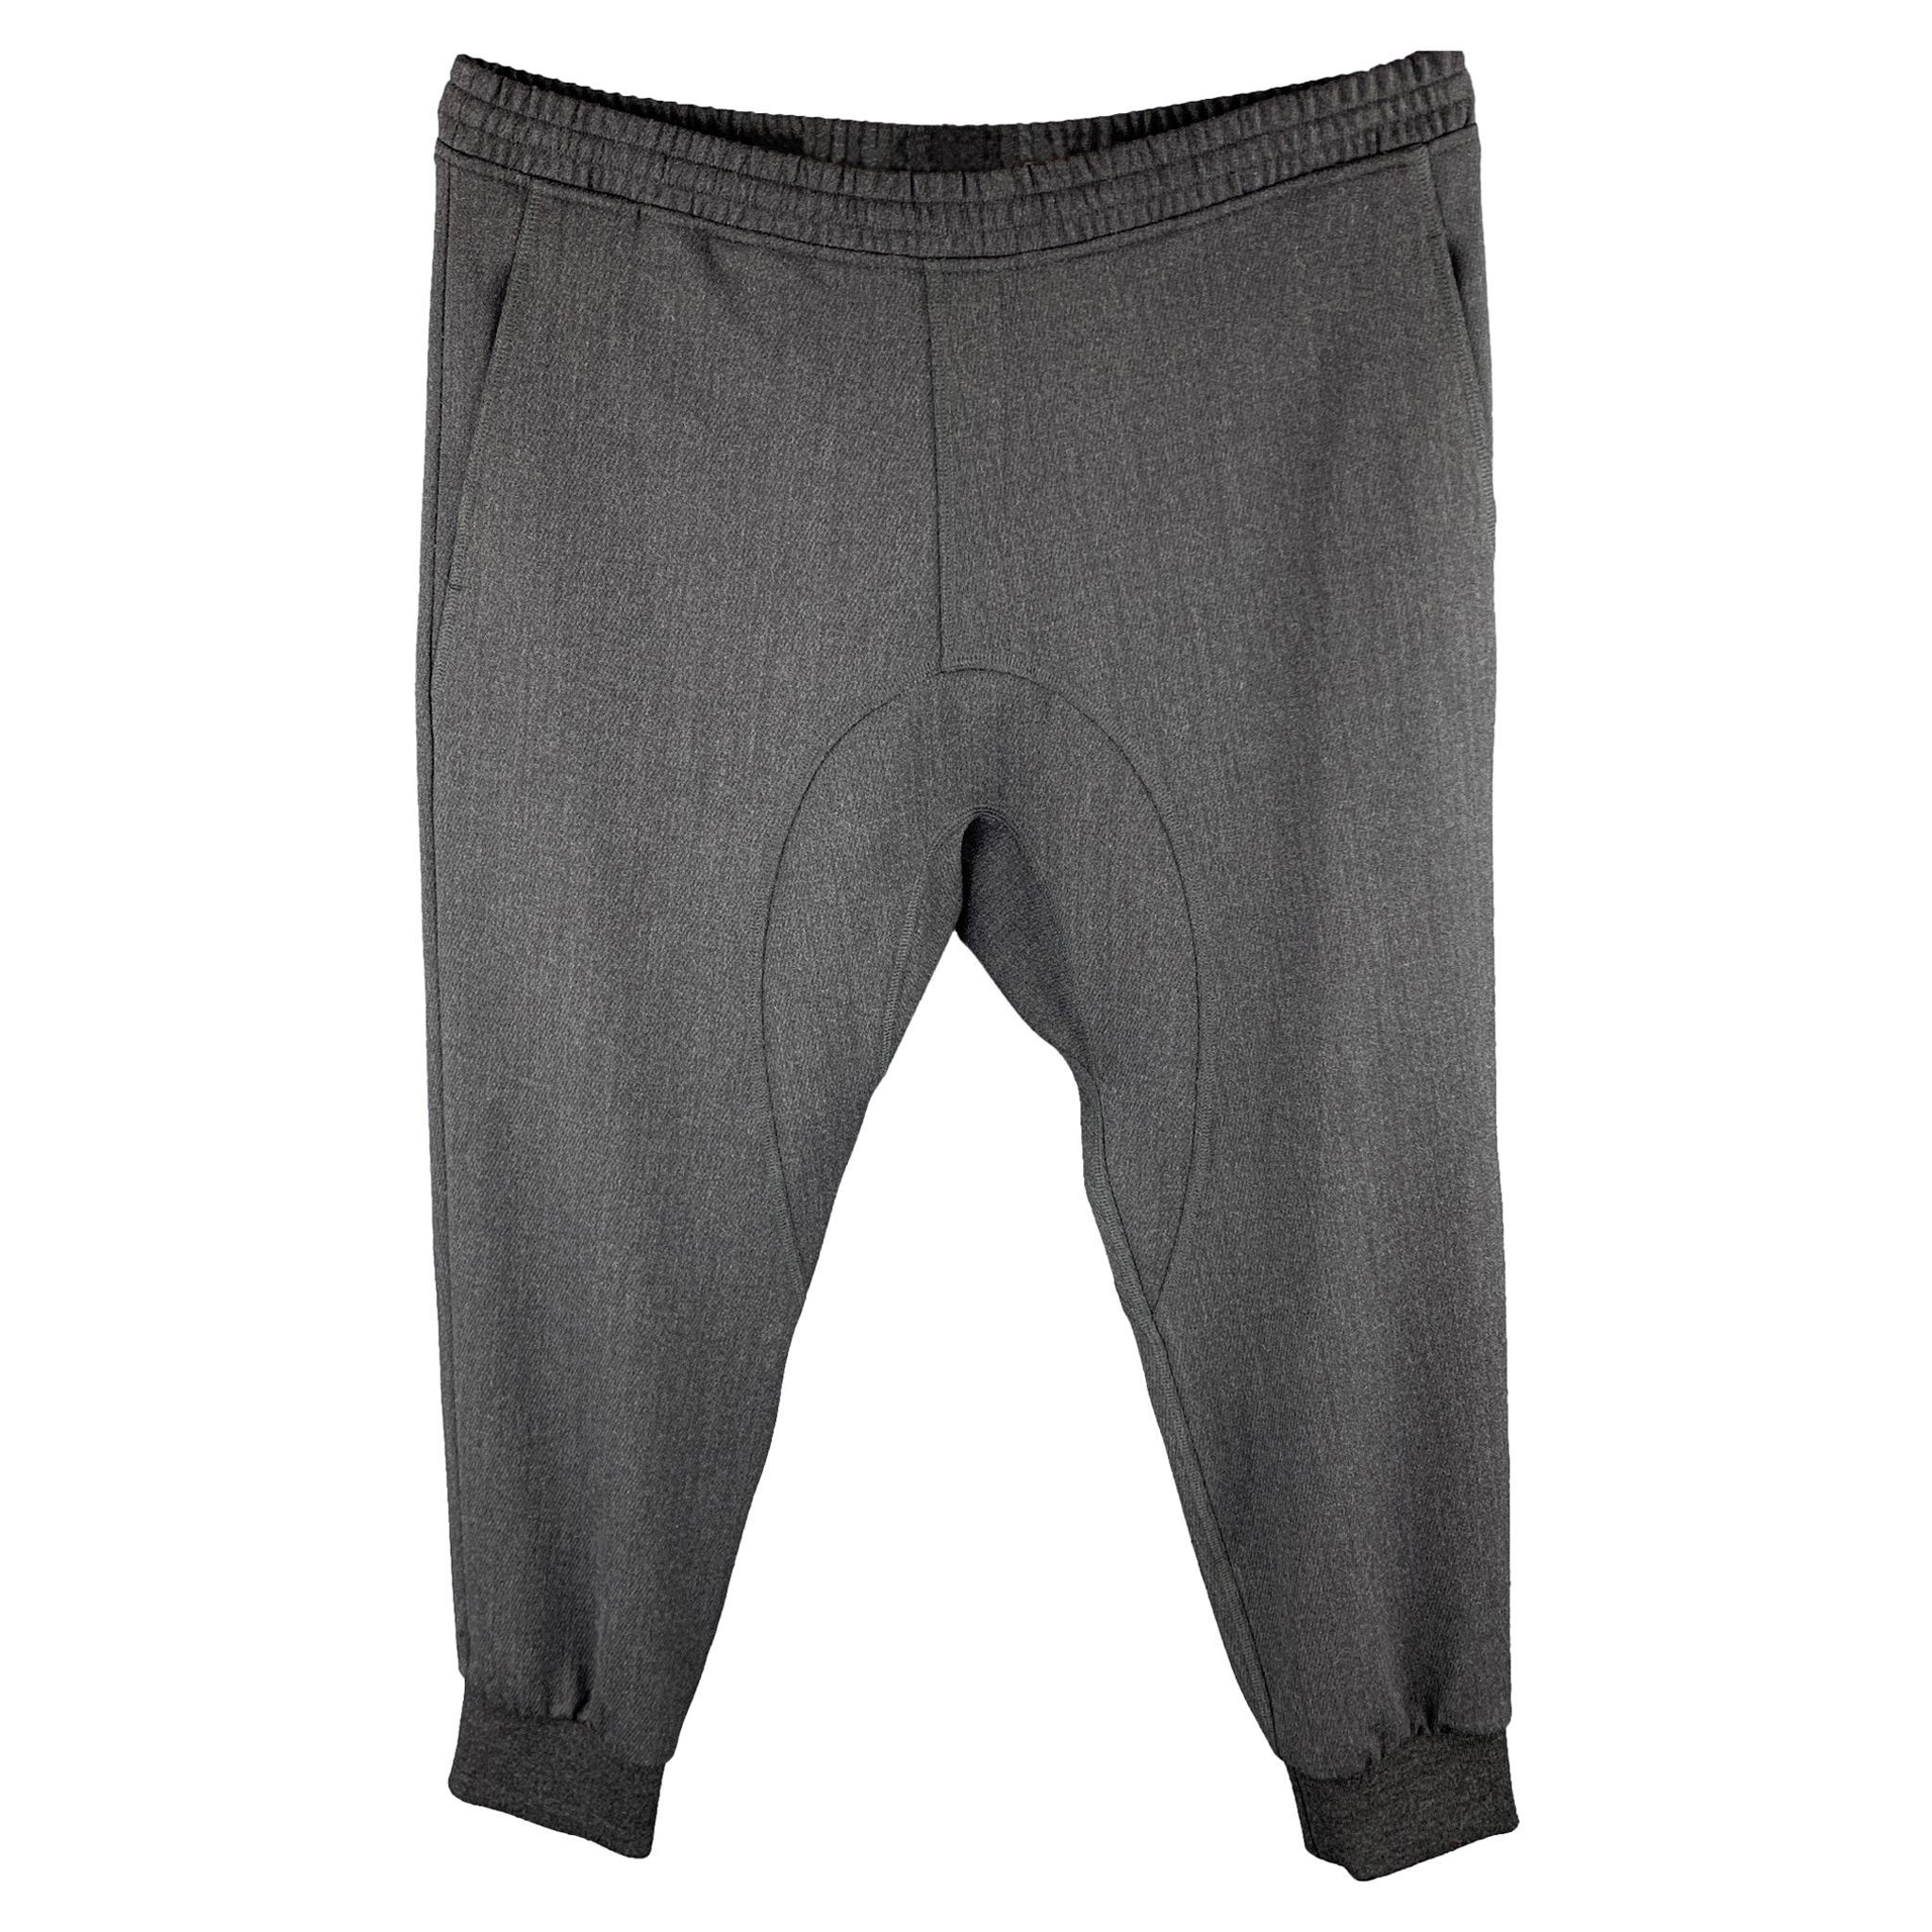 NEIL BARRETT Size 38 Charcoal Wool Blend Elastic Waistband Casual Pants